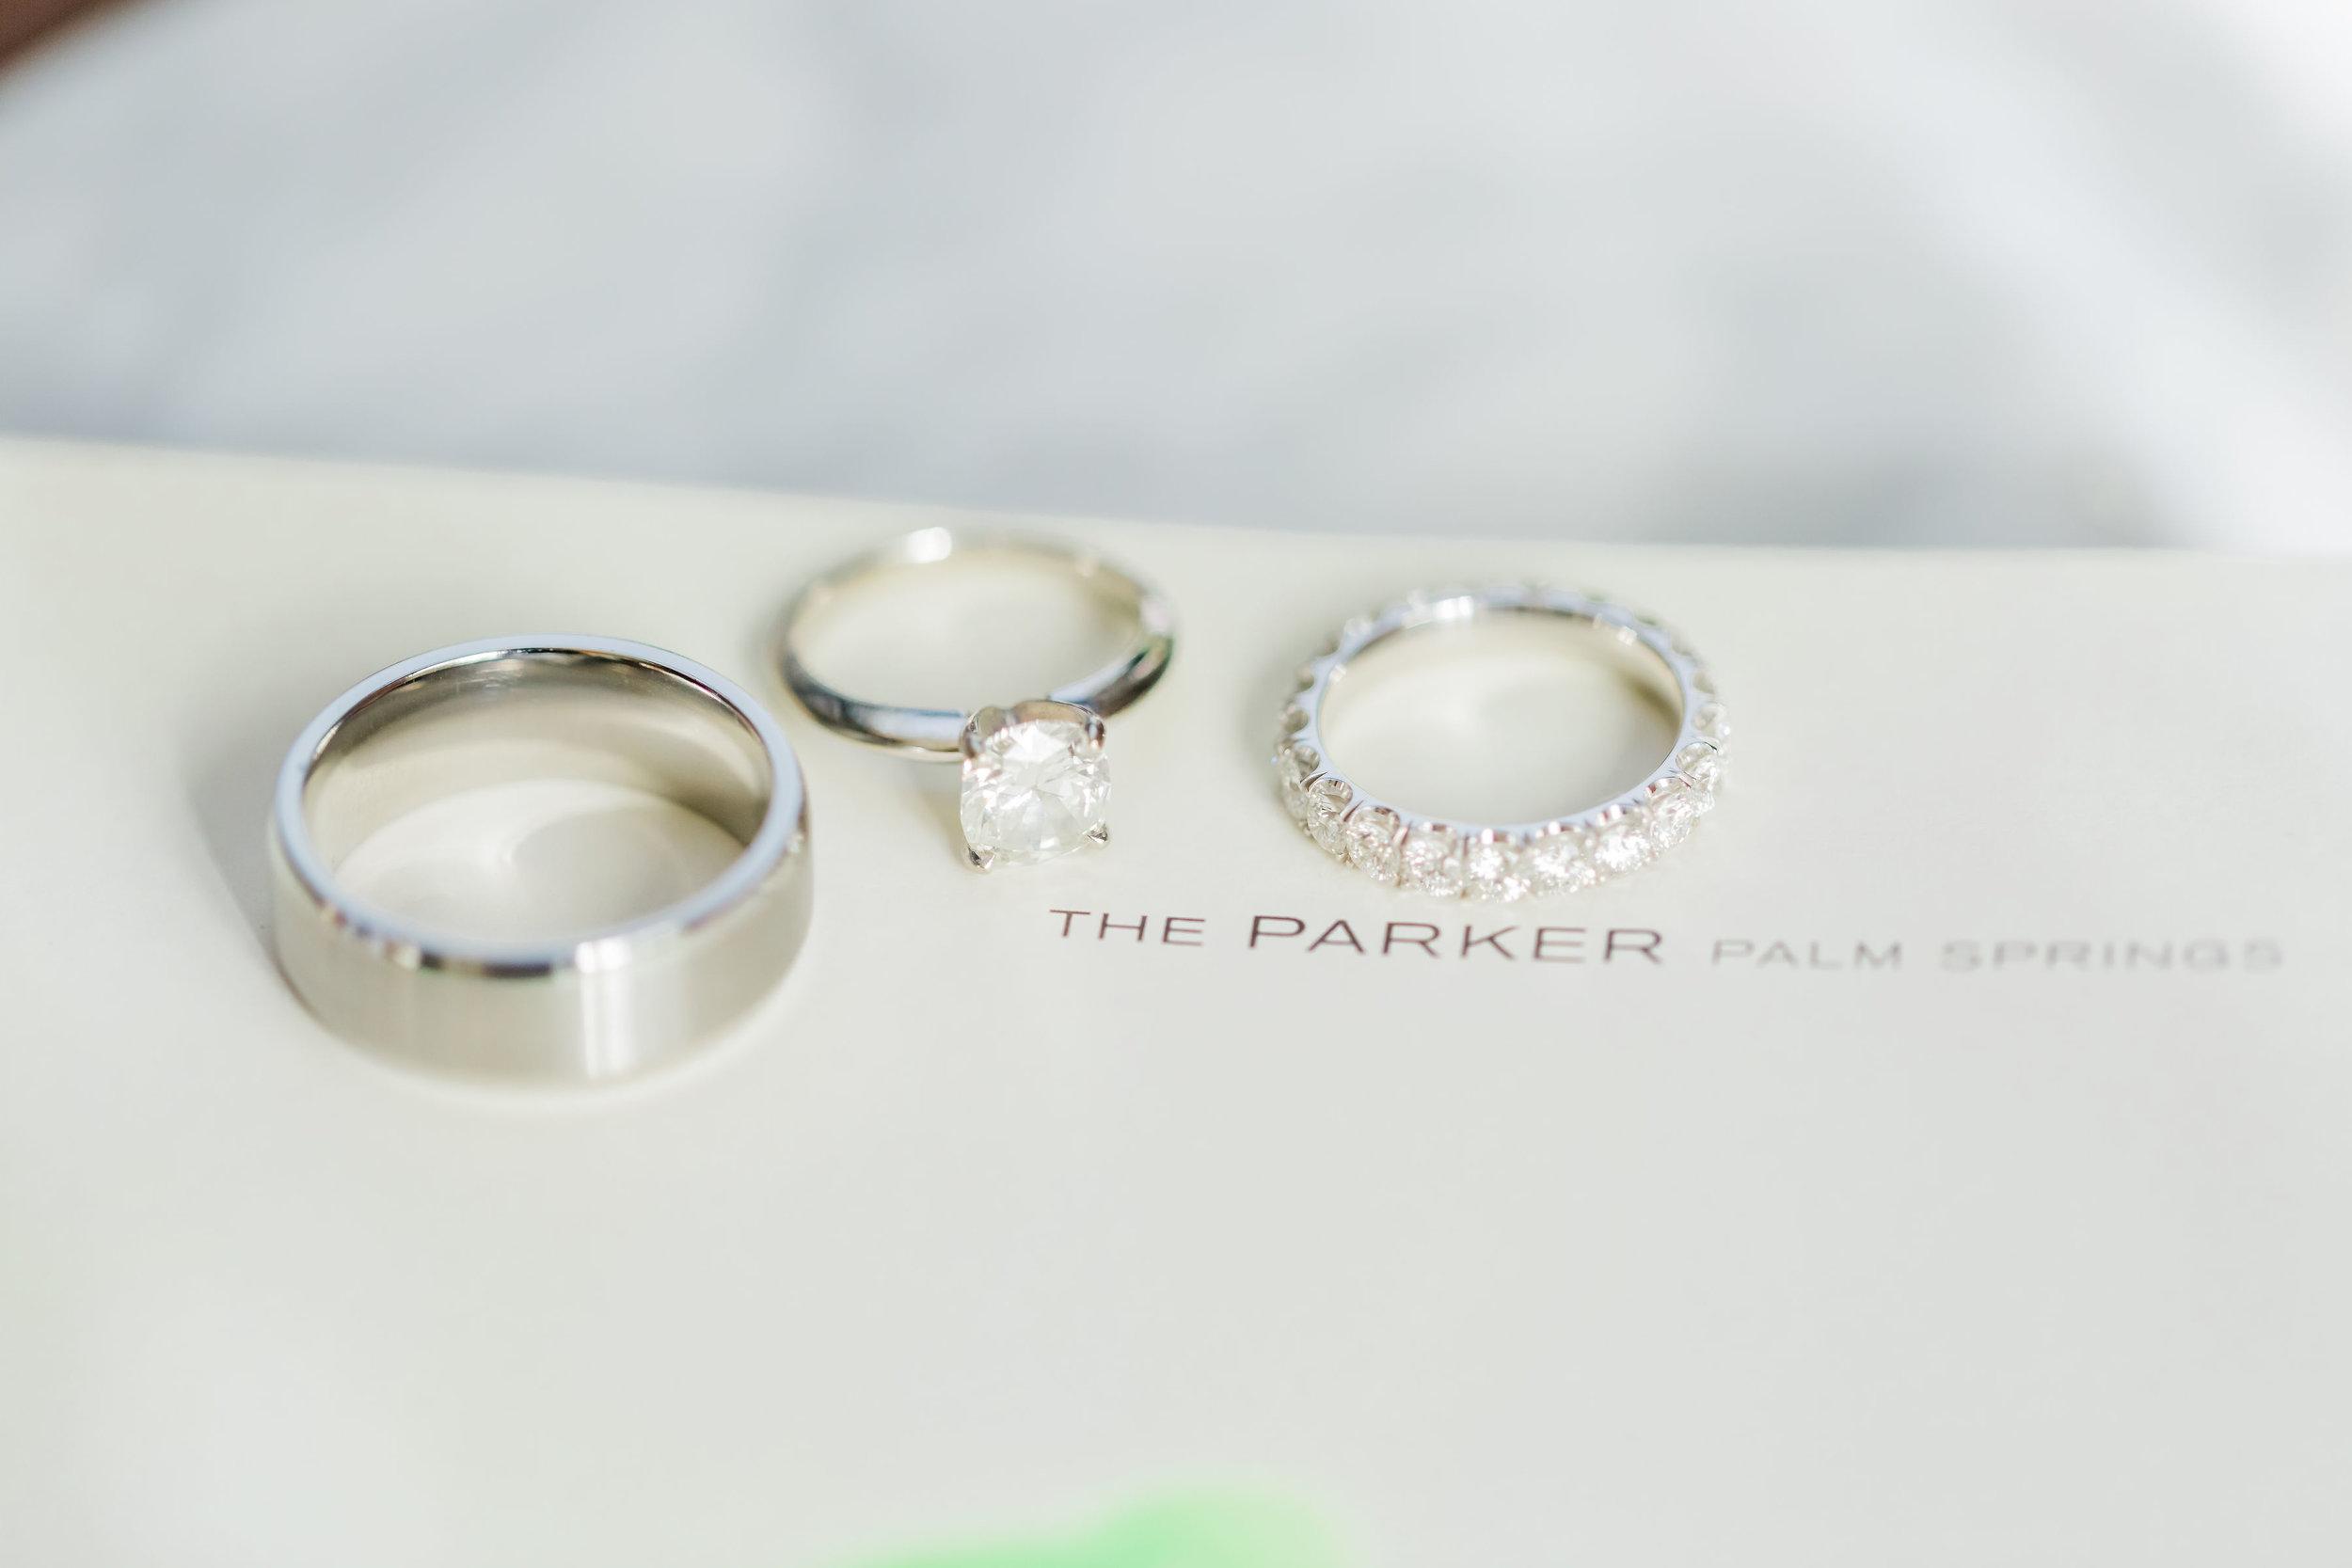 thao.chris.wedding.parker.palm.springs-8.jpg